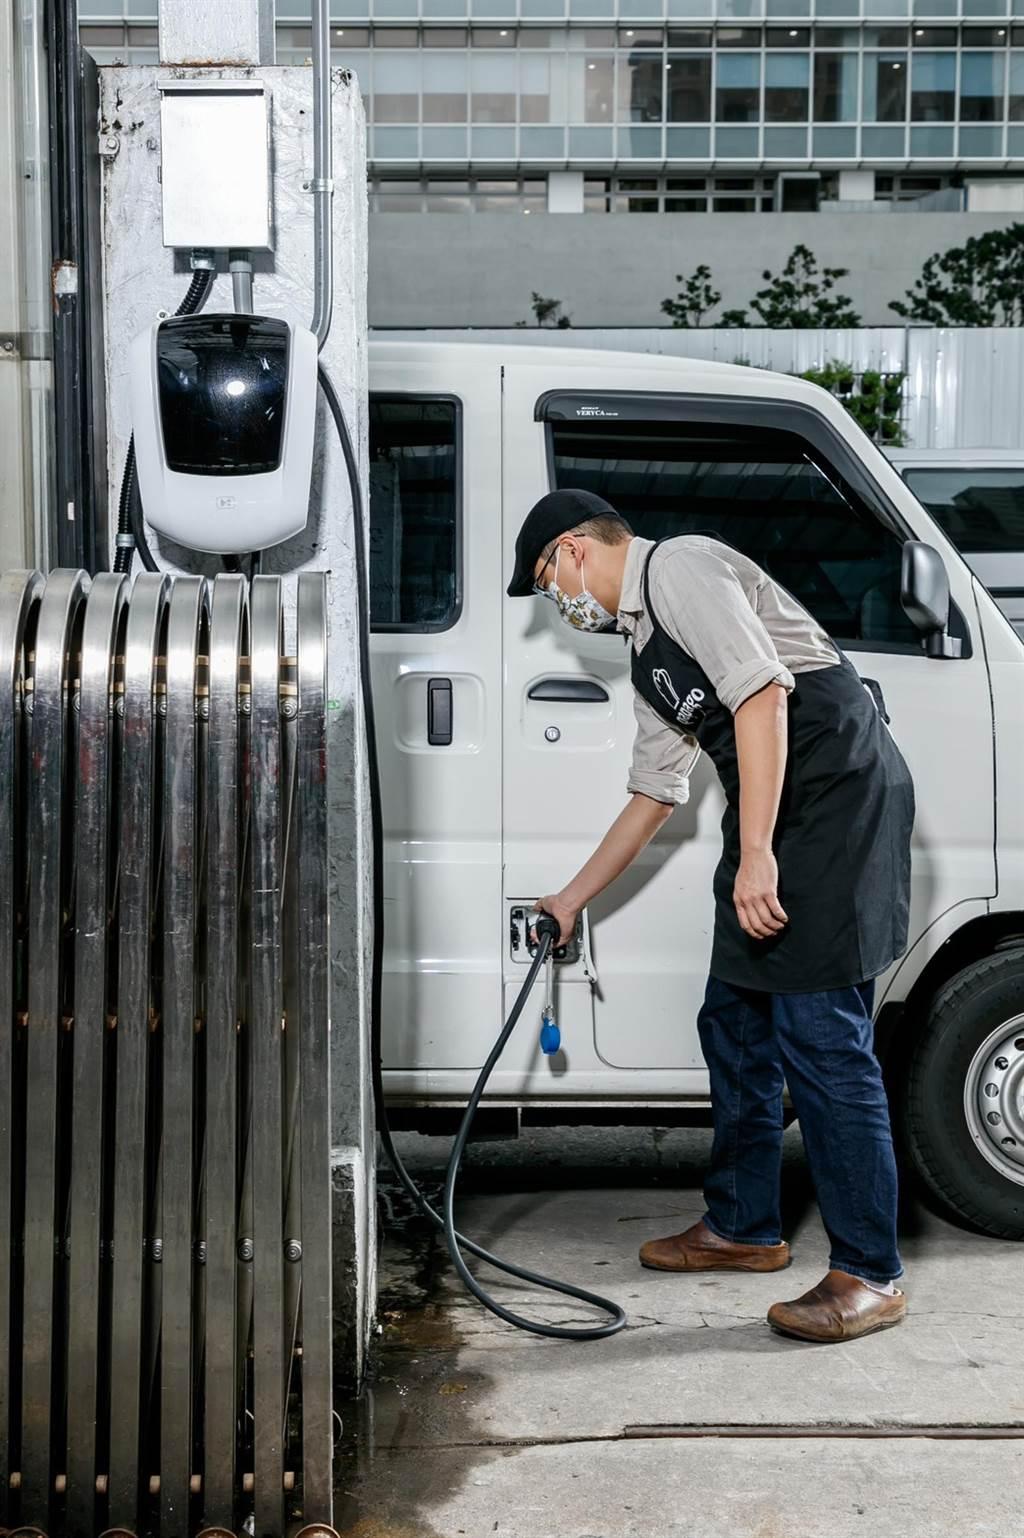 e-VERYCA菱利電動車採用與BMW同等級Samsung SDI 電池,透過壁掛充電器便利充電。